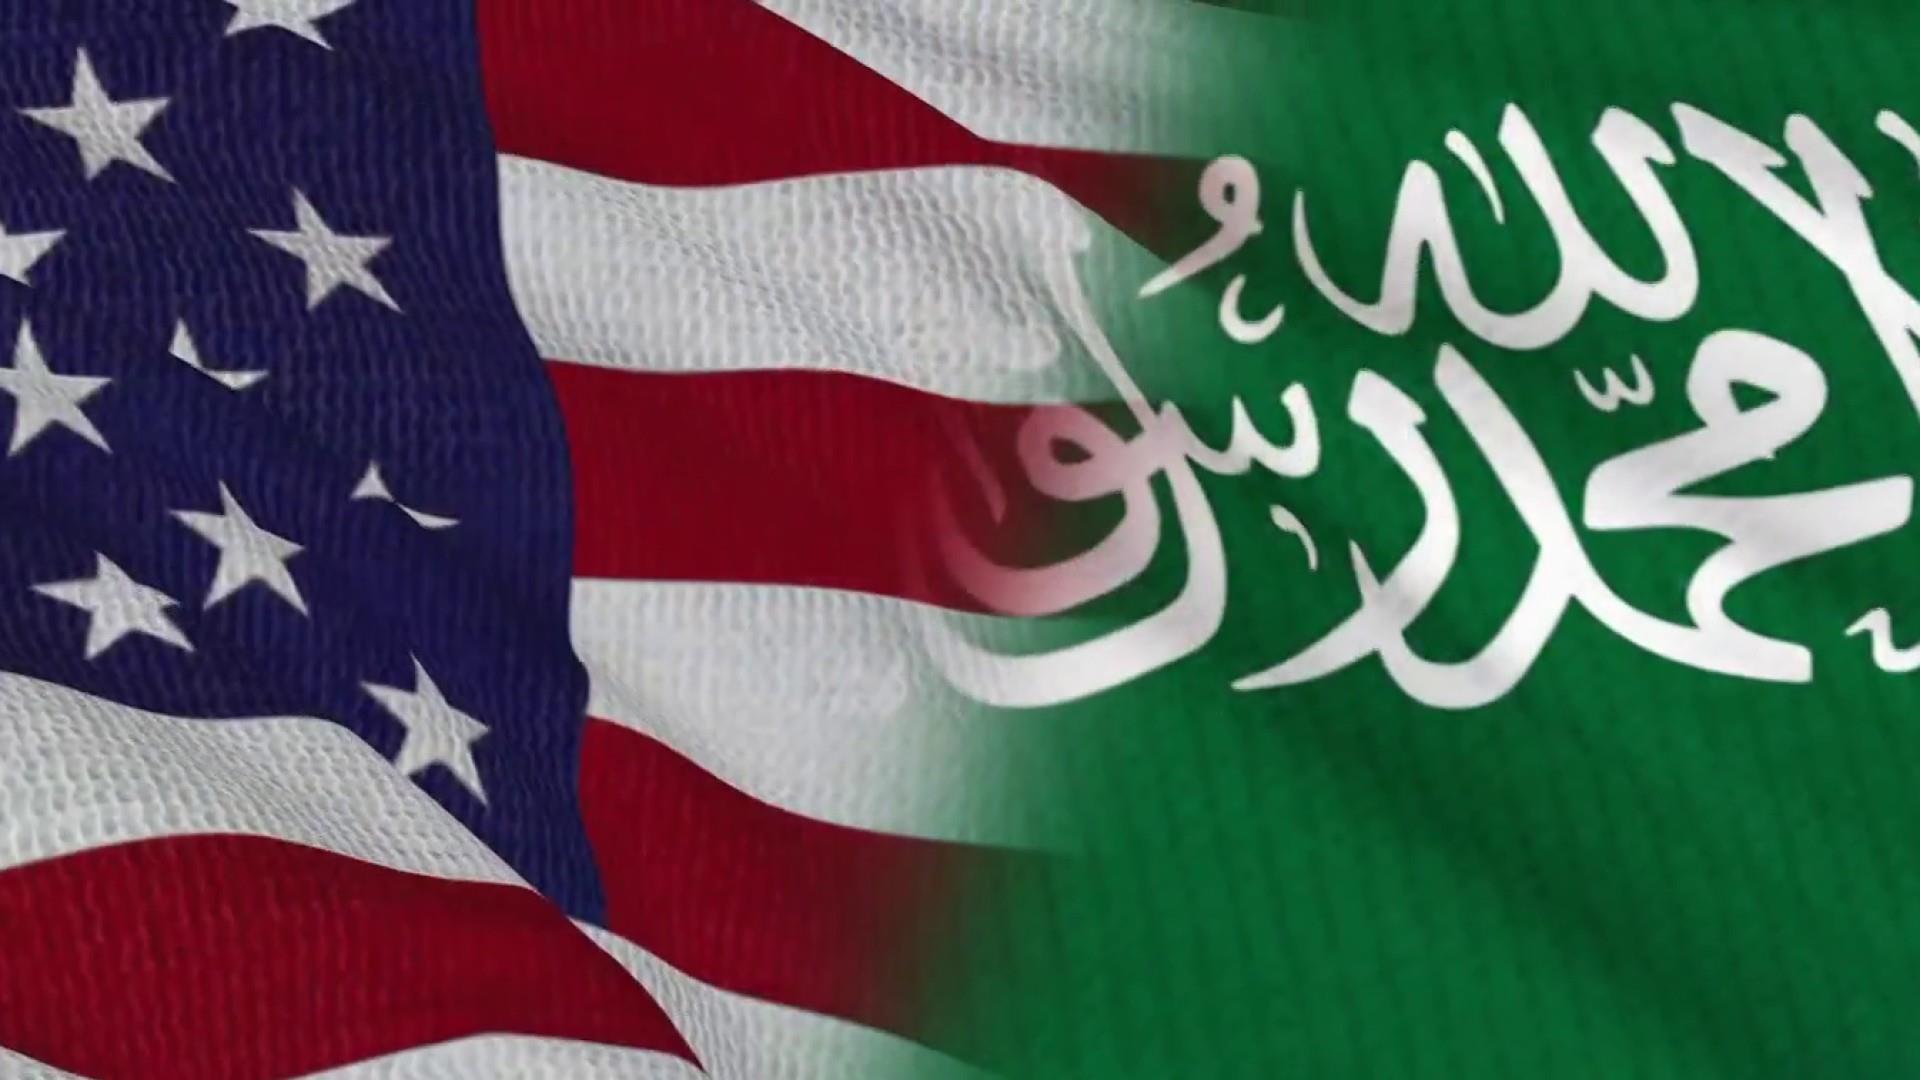 Trump dismisses CIA conclusion that Saudi Prince was responsible for Khashoggi murder